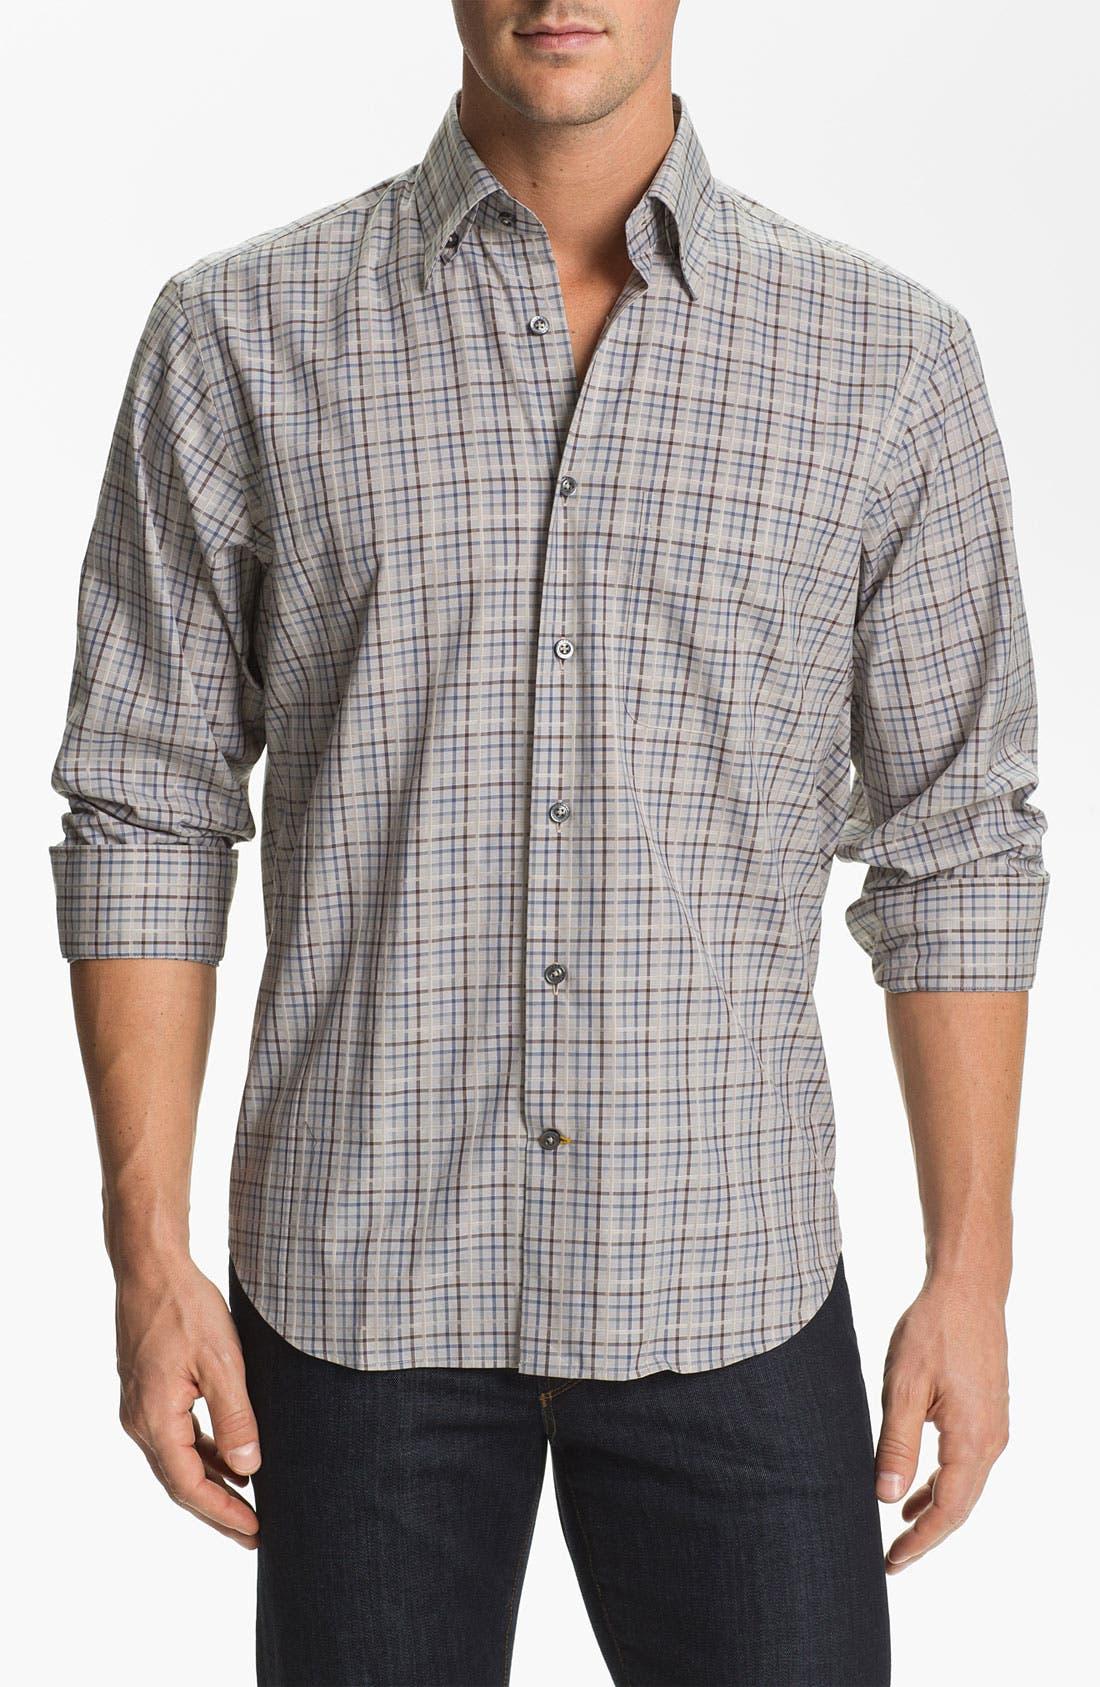 Main Image - Robert Talbott Regular Fit Sport Shirt